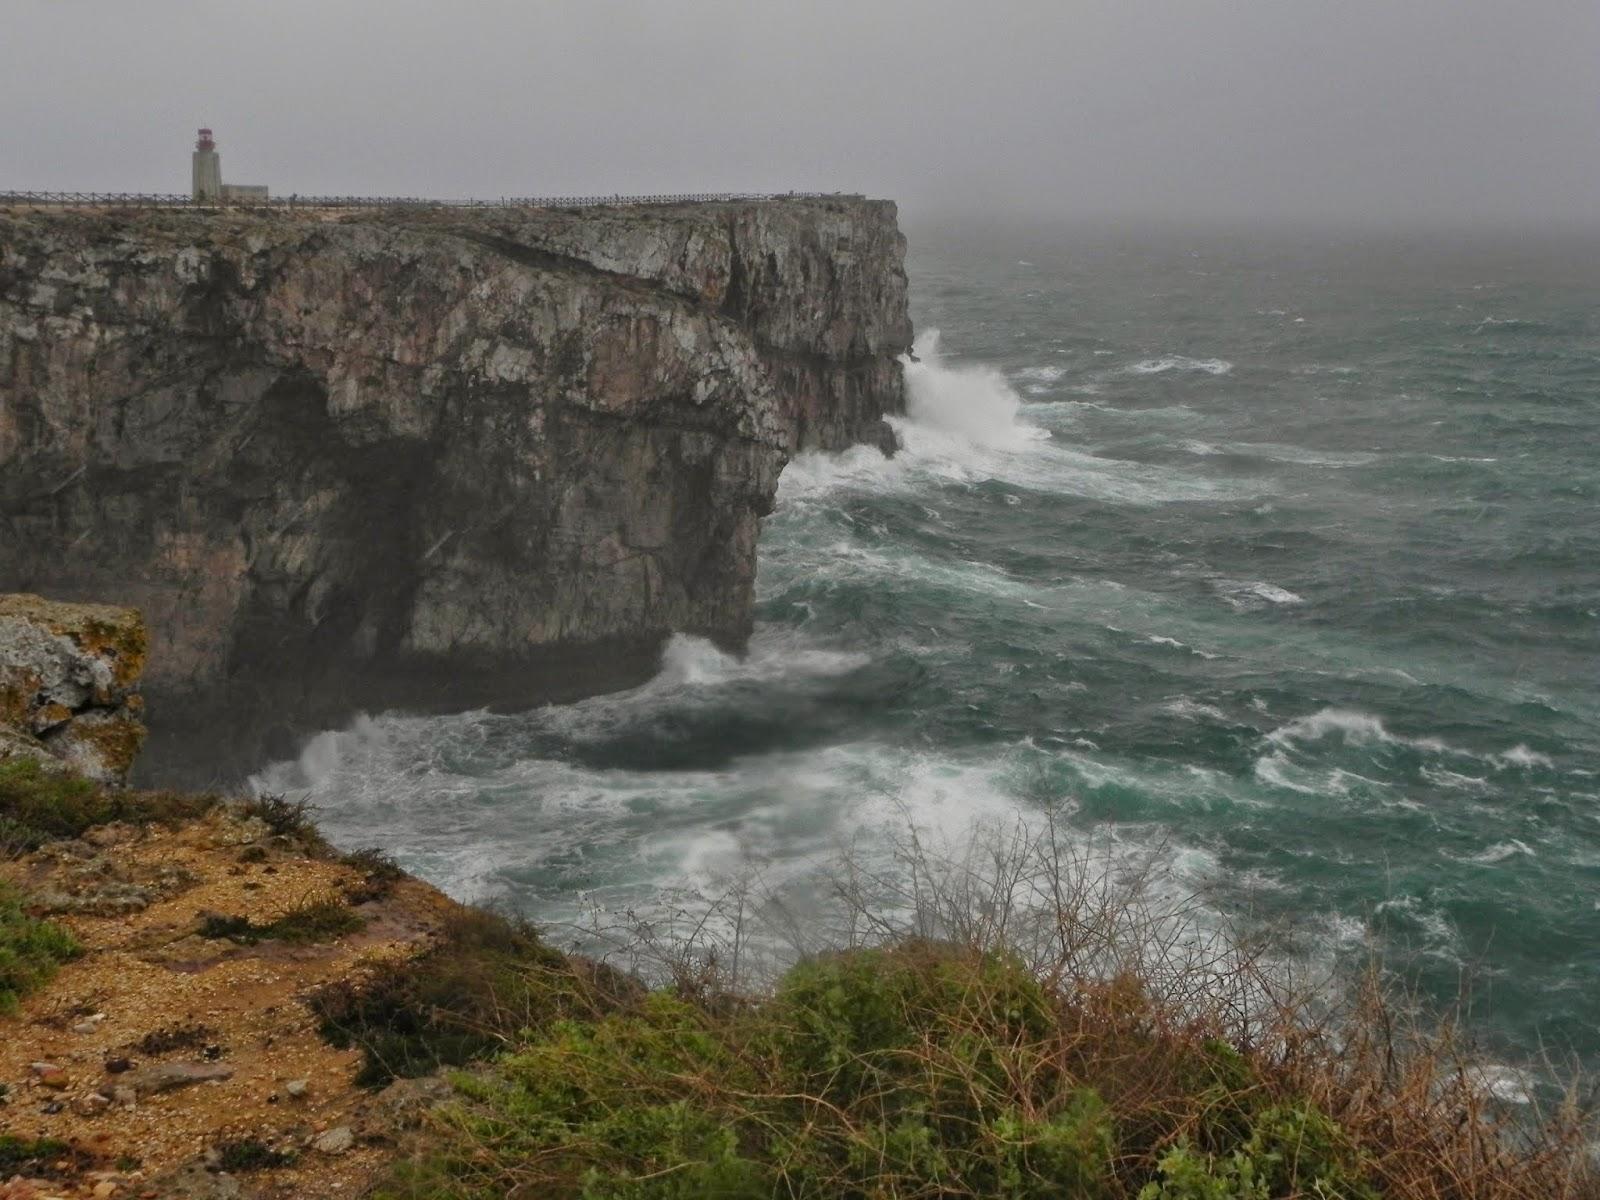 höchste klippe europa